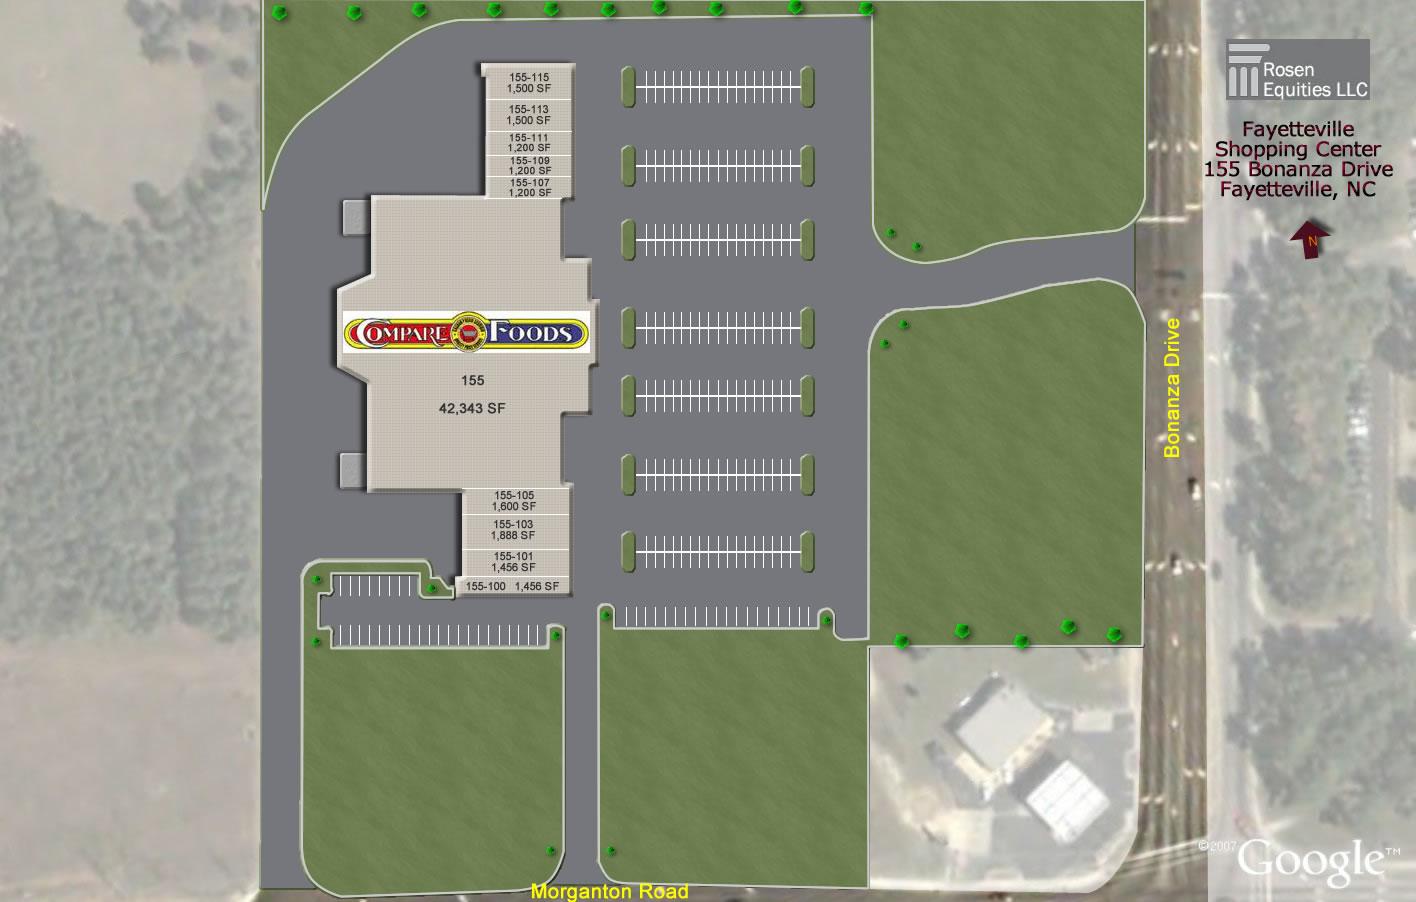 etteville-Compare Foods Center Siteplan